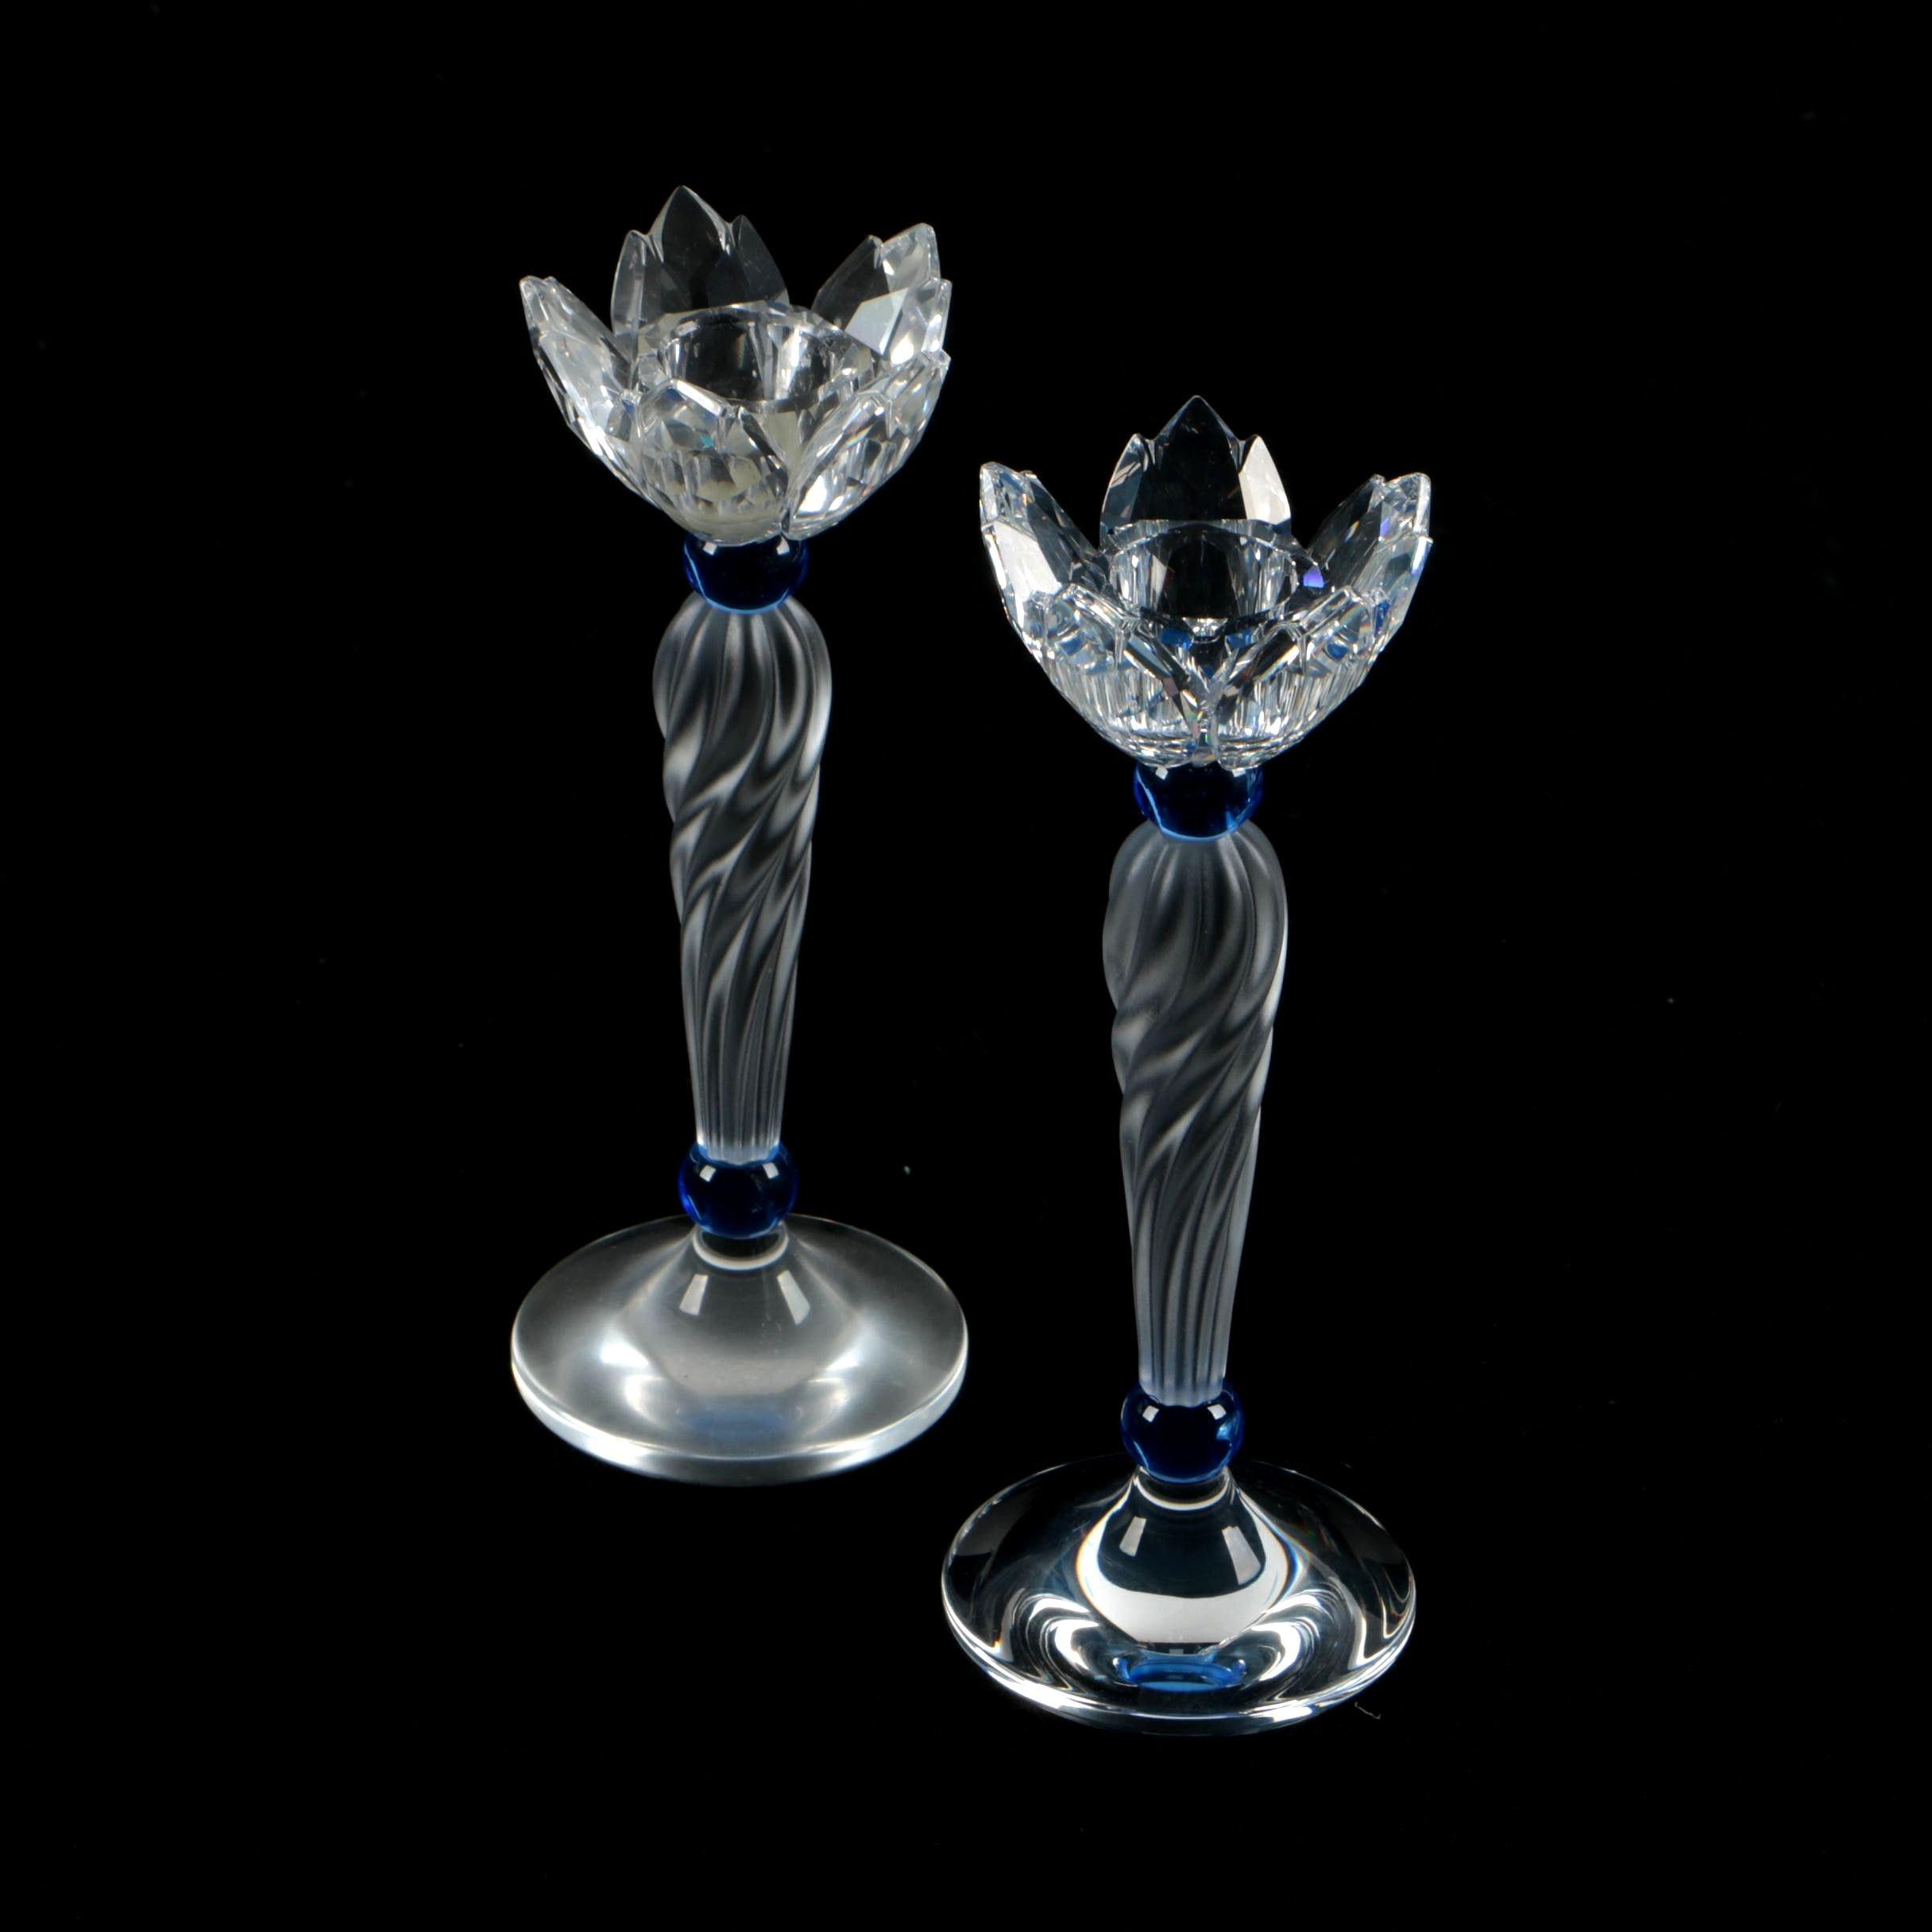 Pair of Swarovski Crystal Candleholders